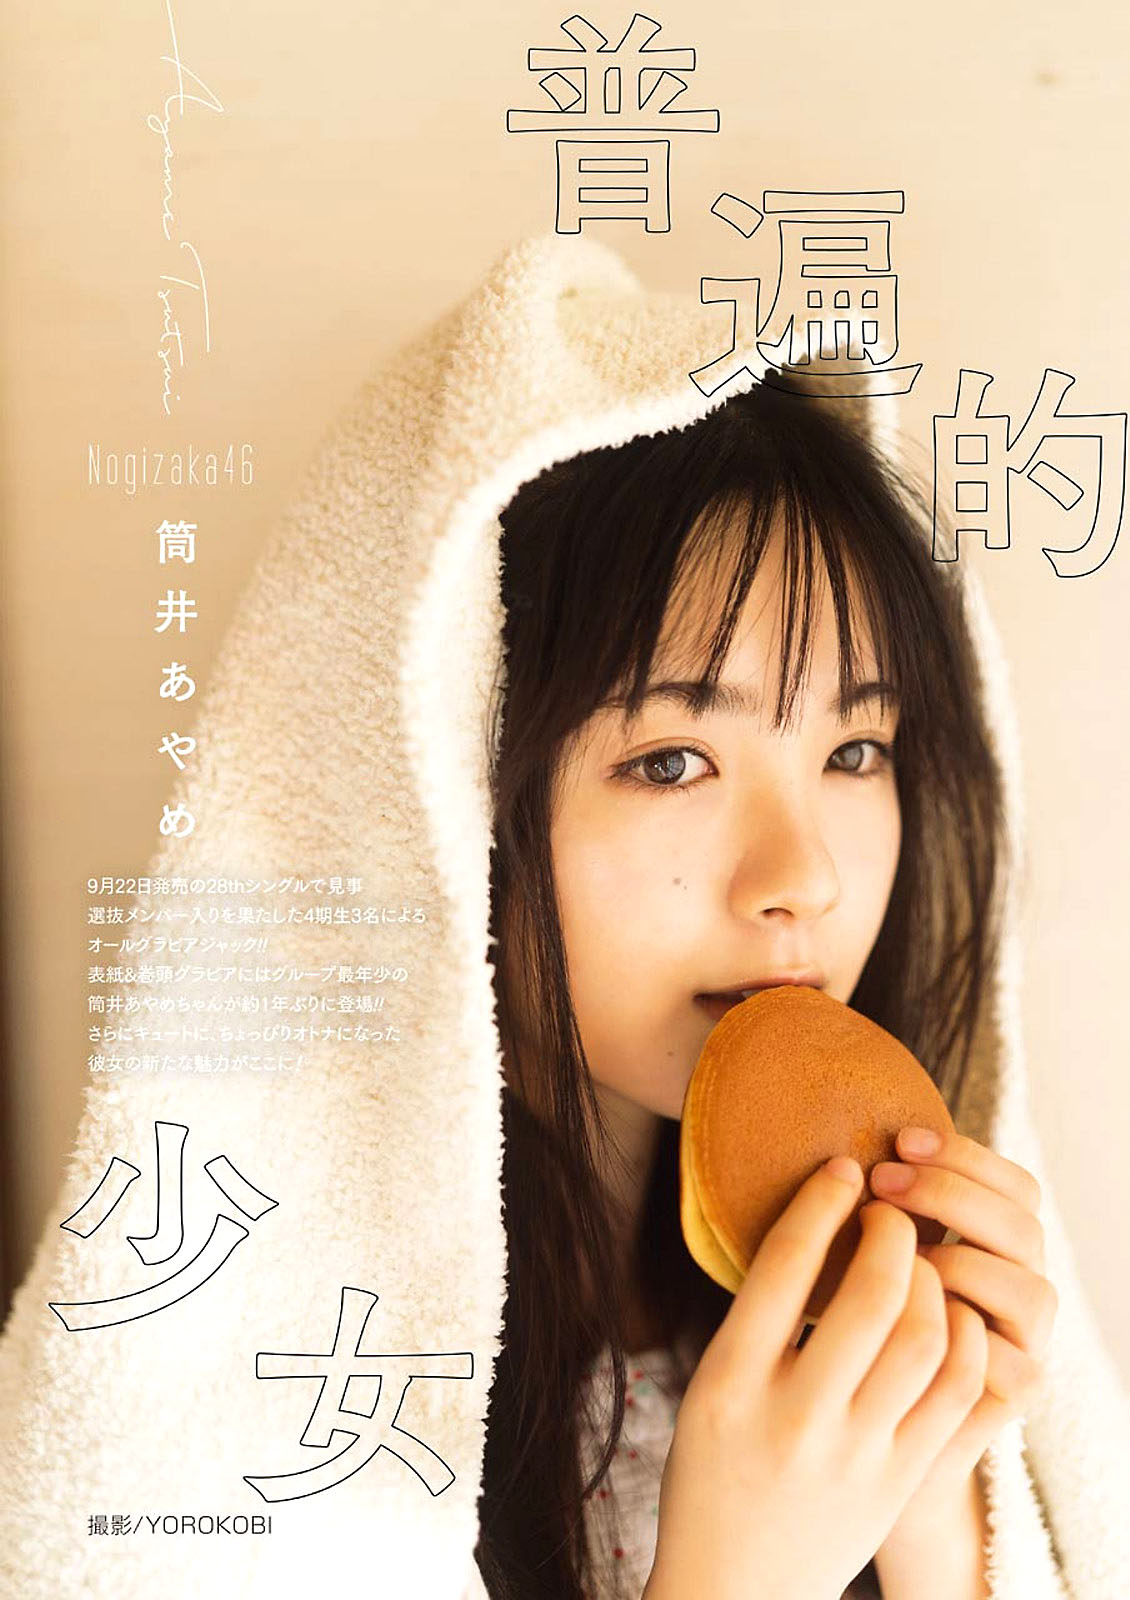 Tsutsue Auame Young Gangan 210917 03.jpg